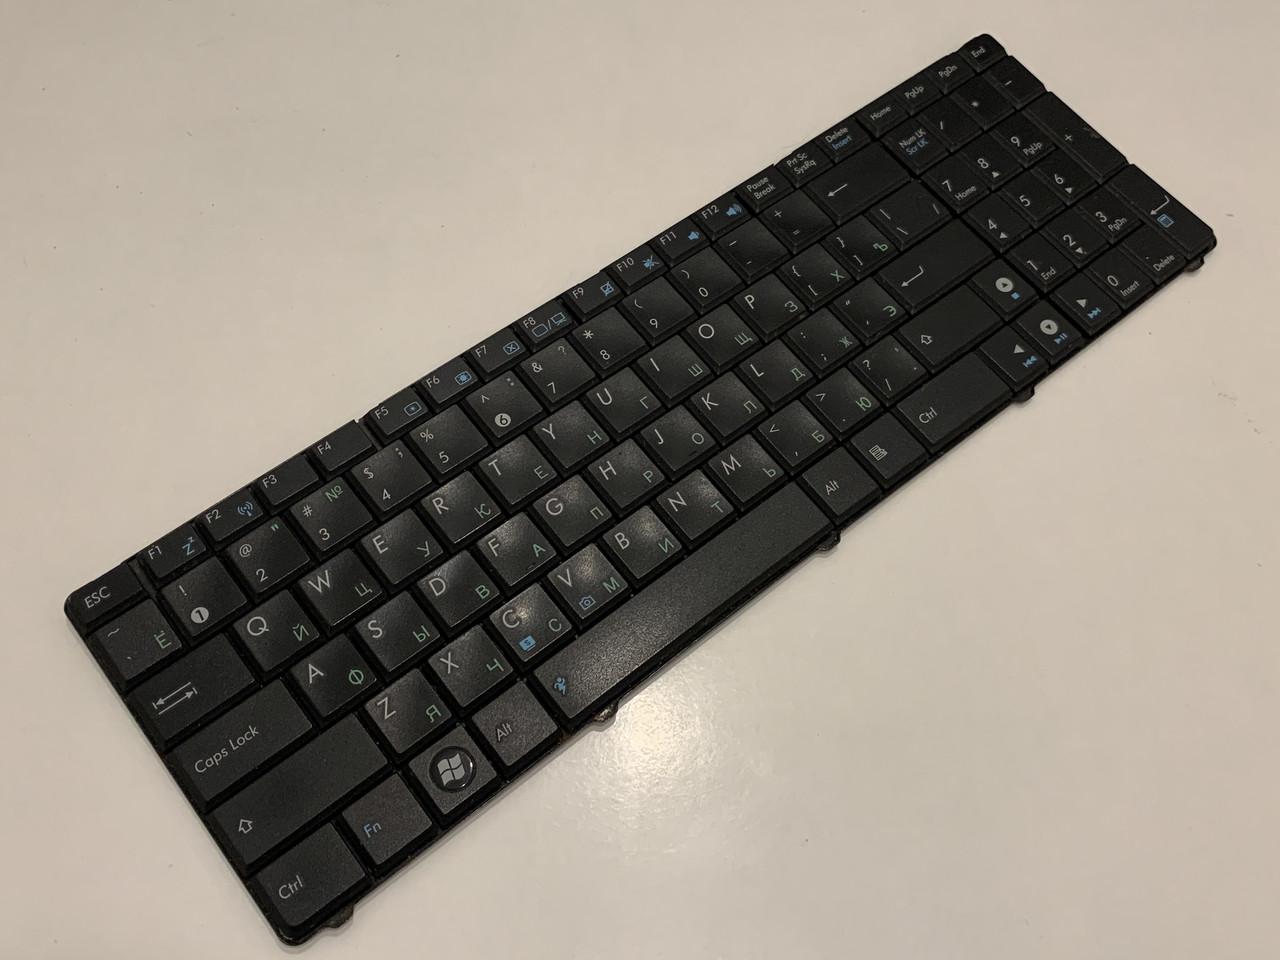 Запчасти для ноутбука Asus K52D - Клавиатура MP-07G73SU-528